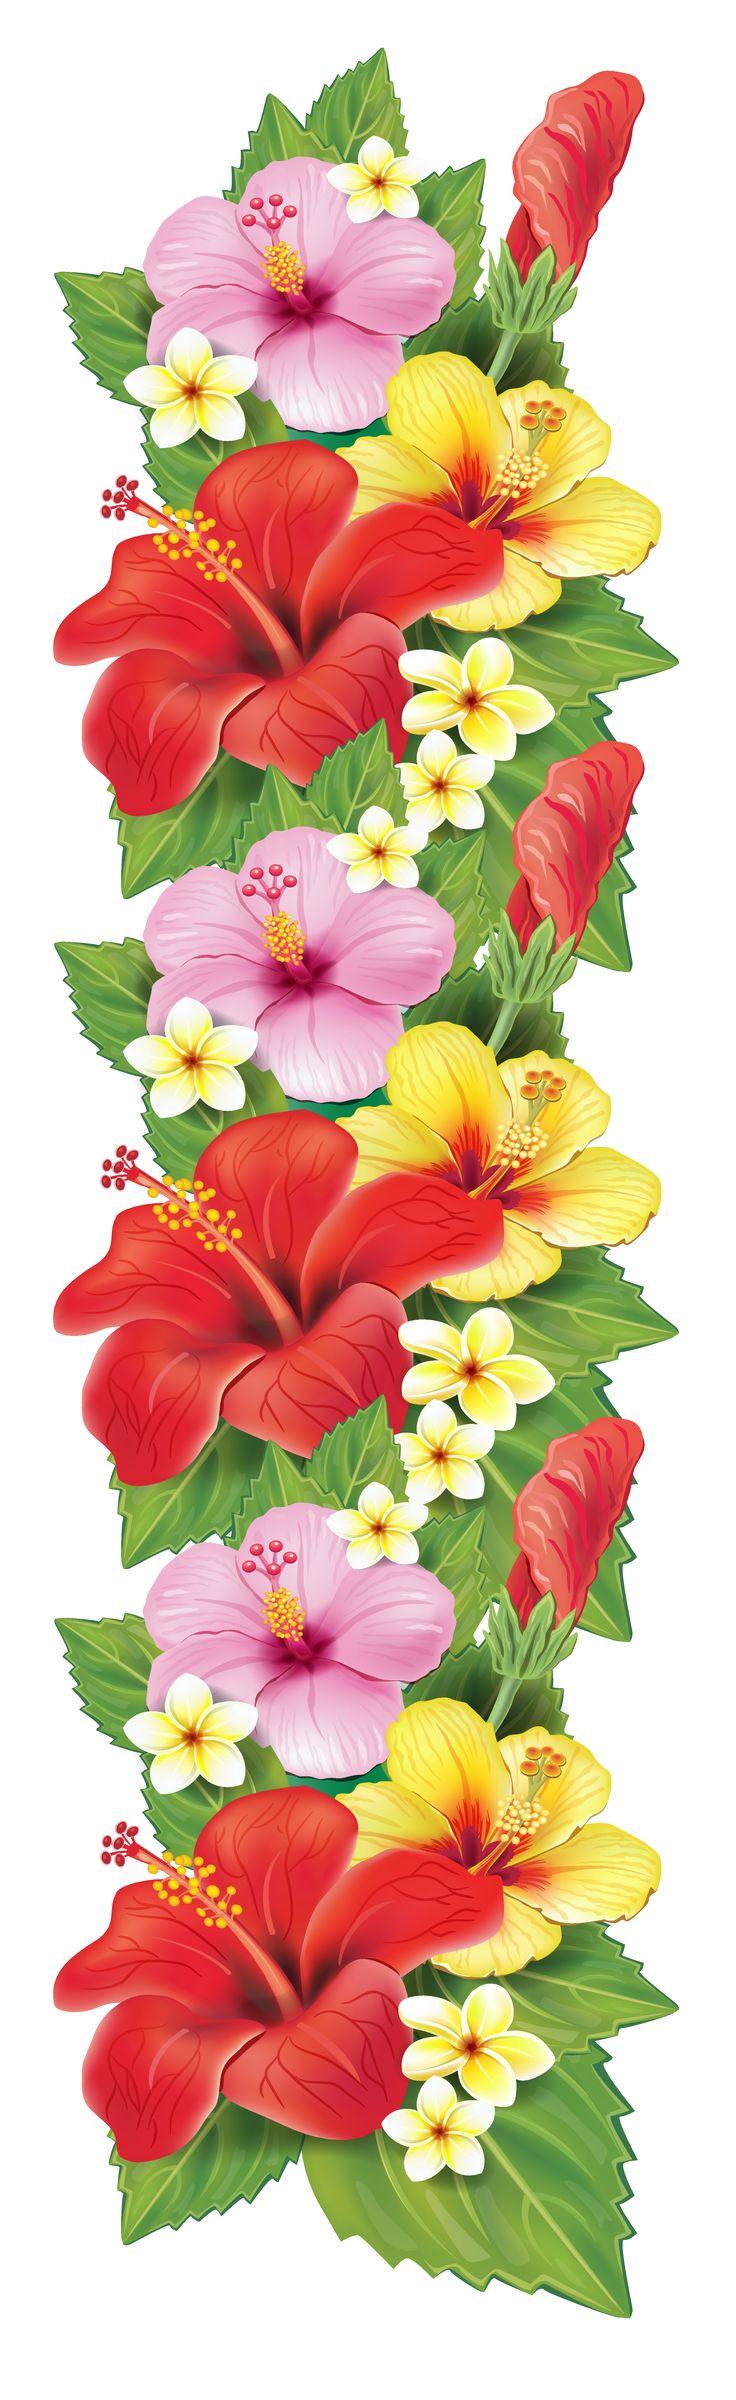 Exotic Flowers Decoration PNG Clipart                                                                                                                                                                                 Más